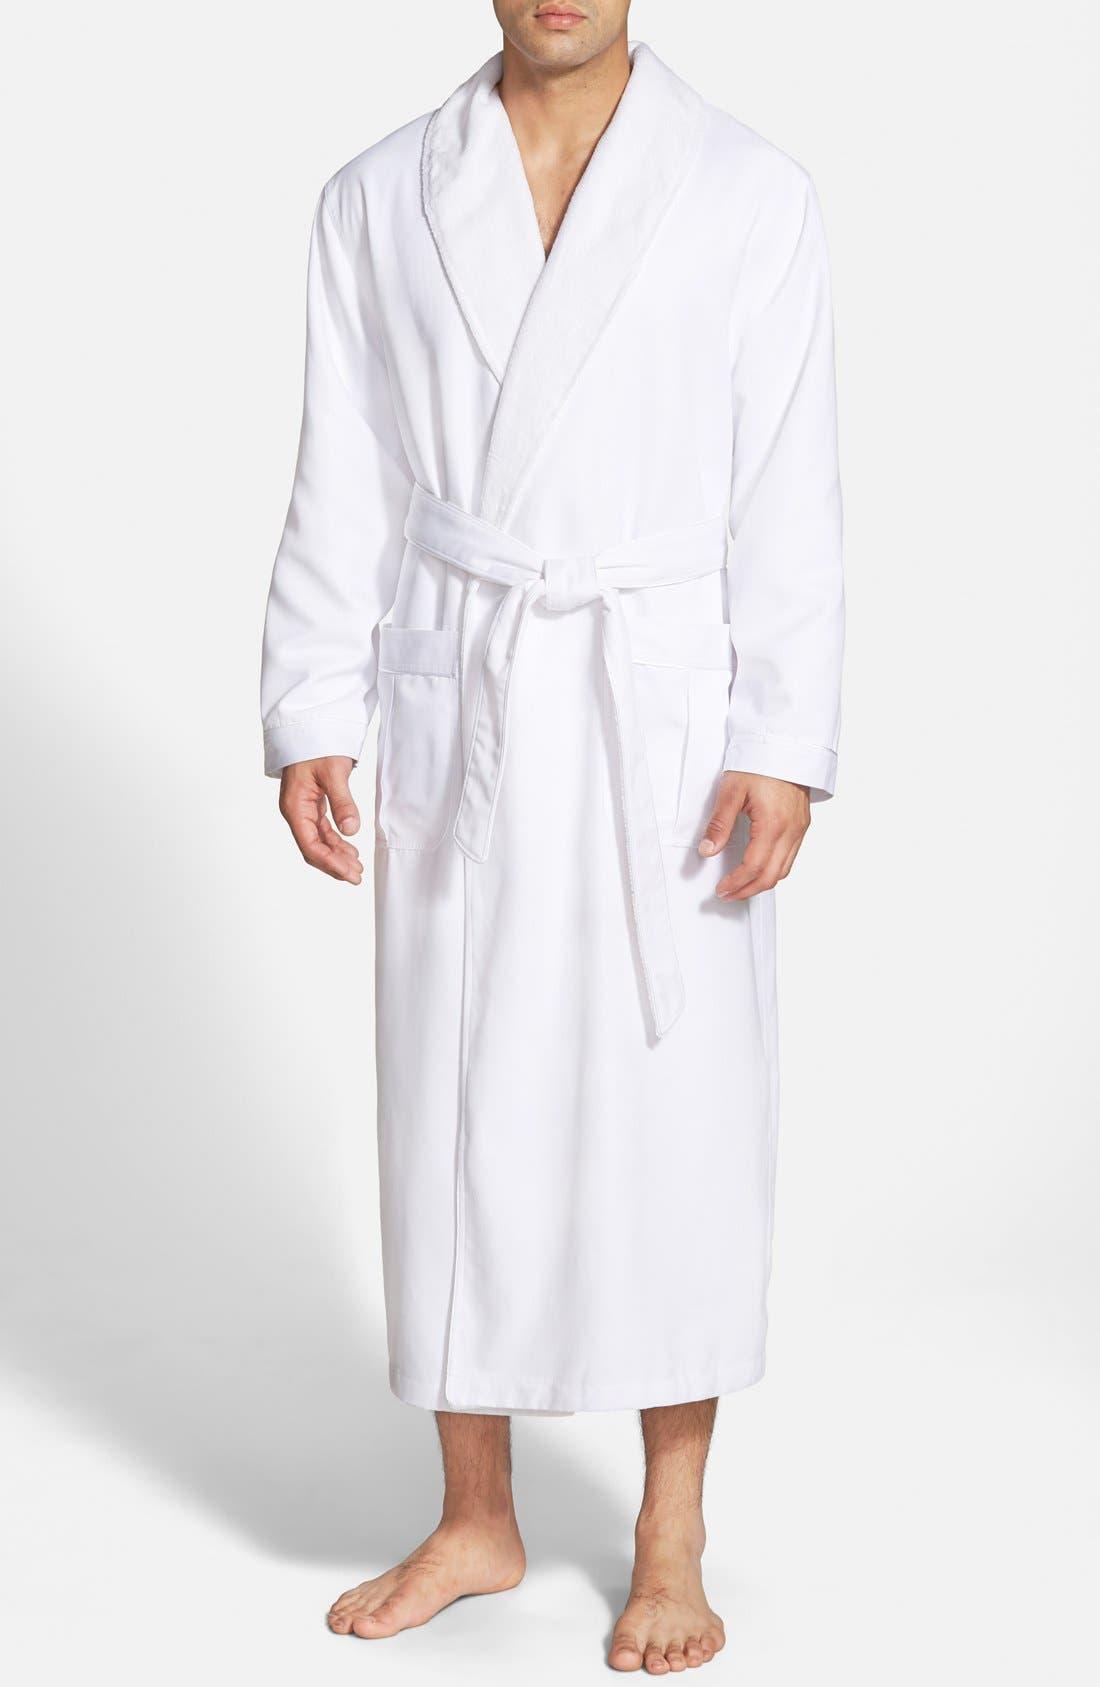 Alternate Image 1 Selected - Majestic International Fleece Lined Robe